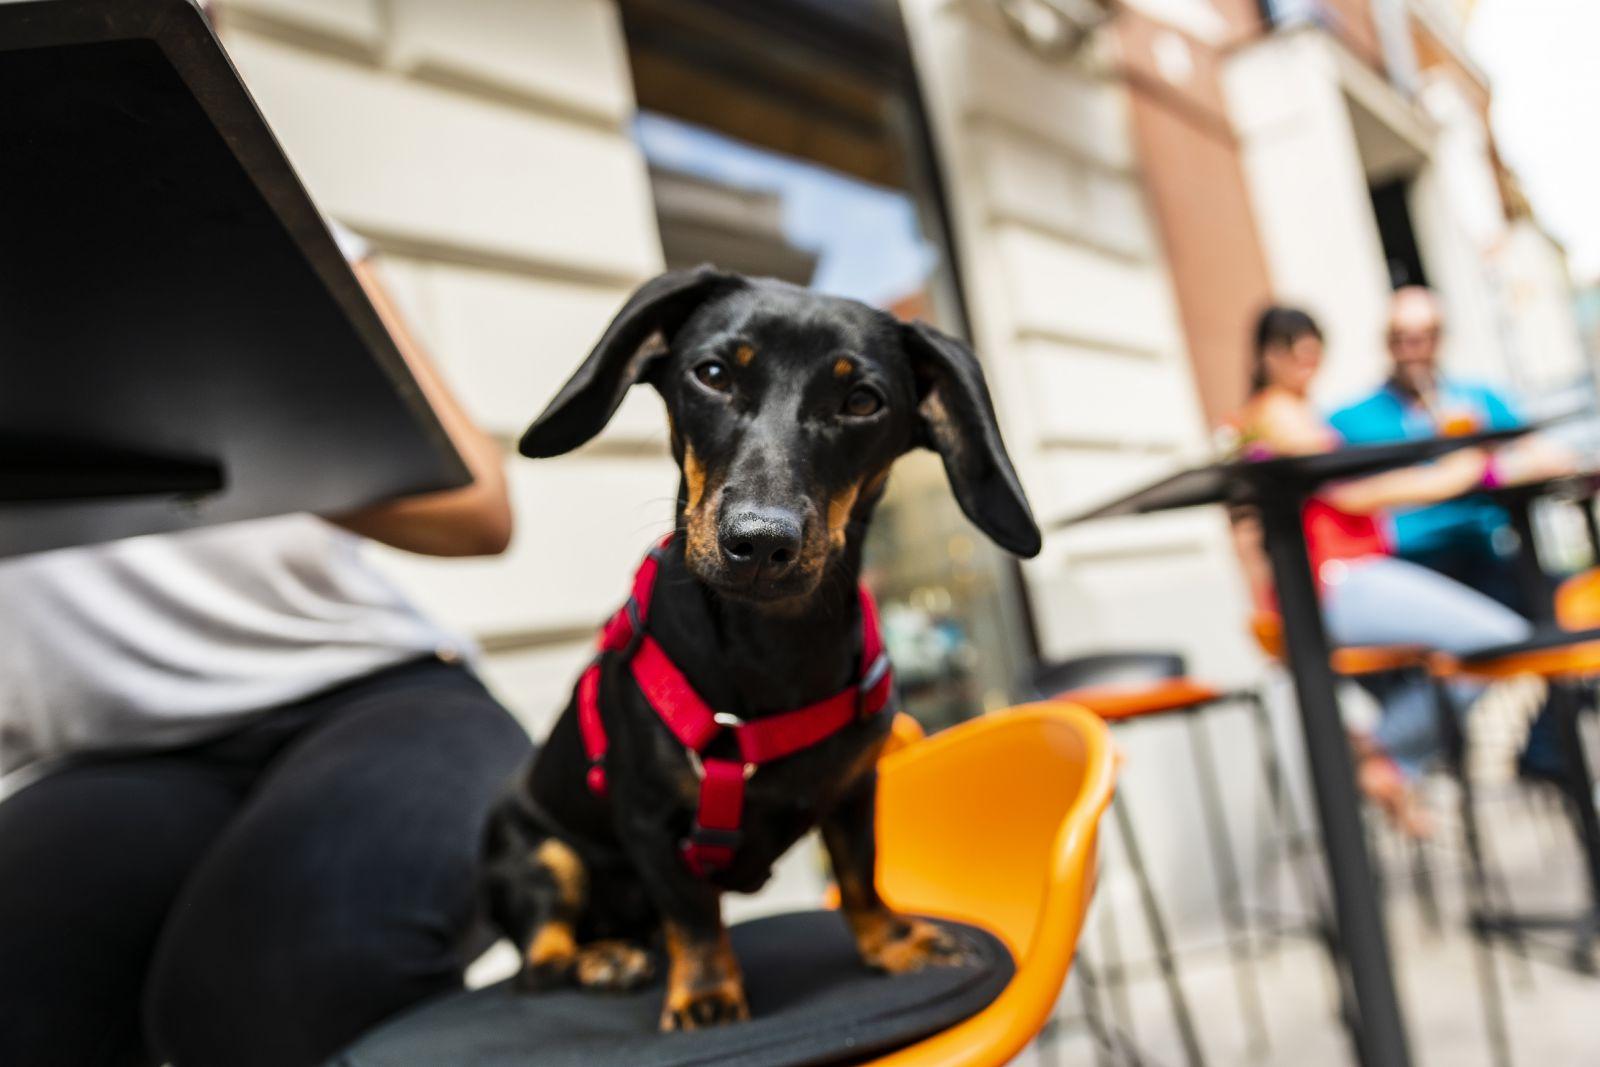 kutyabarat kutyabarát borbár